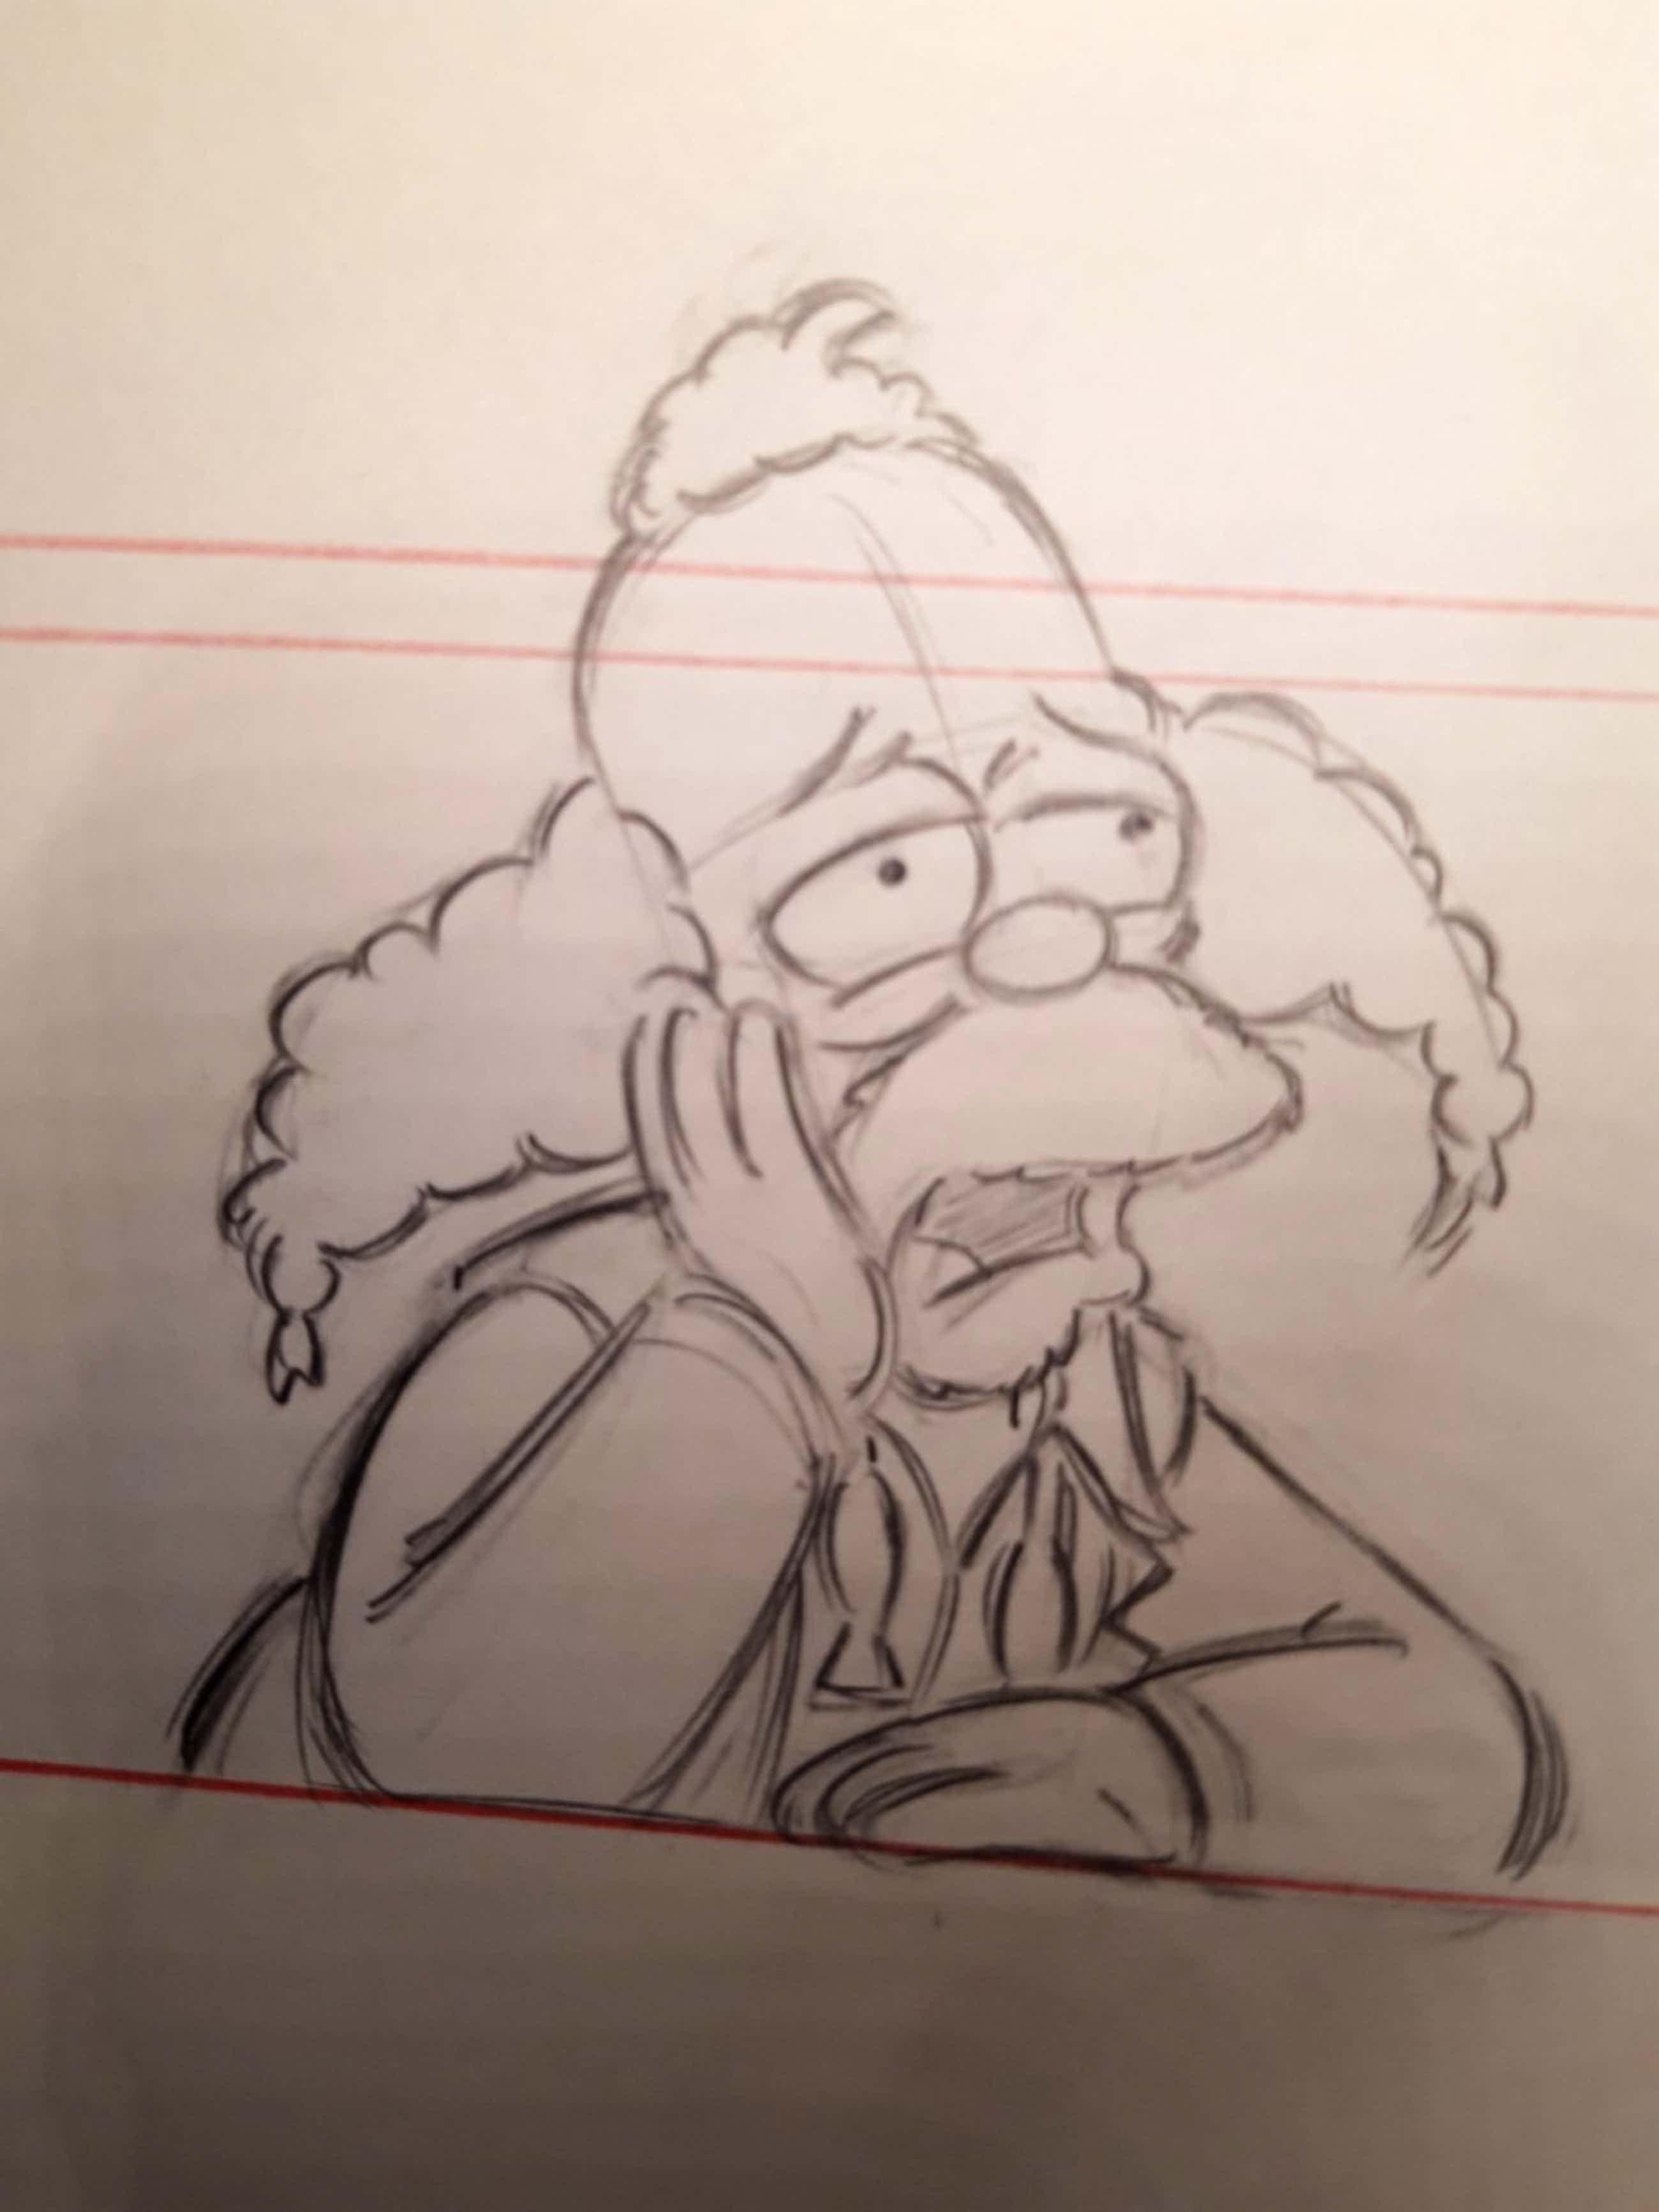 Matt Groening - originele productie tekening, The Simpsons, Krusty The Clown kopen? Bied vanaf 70!